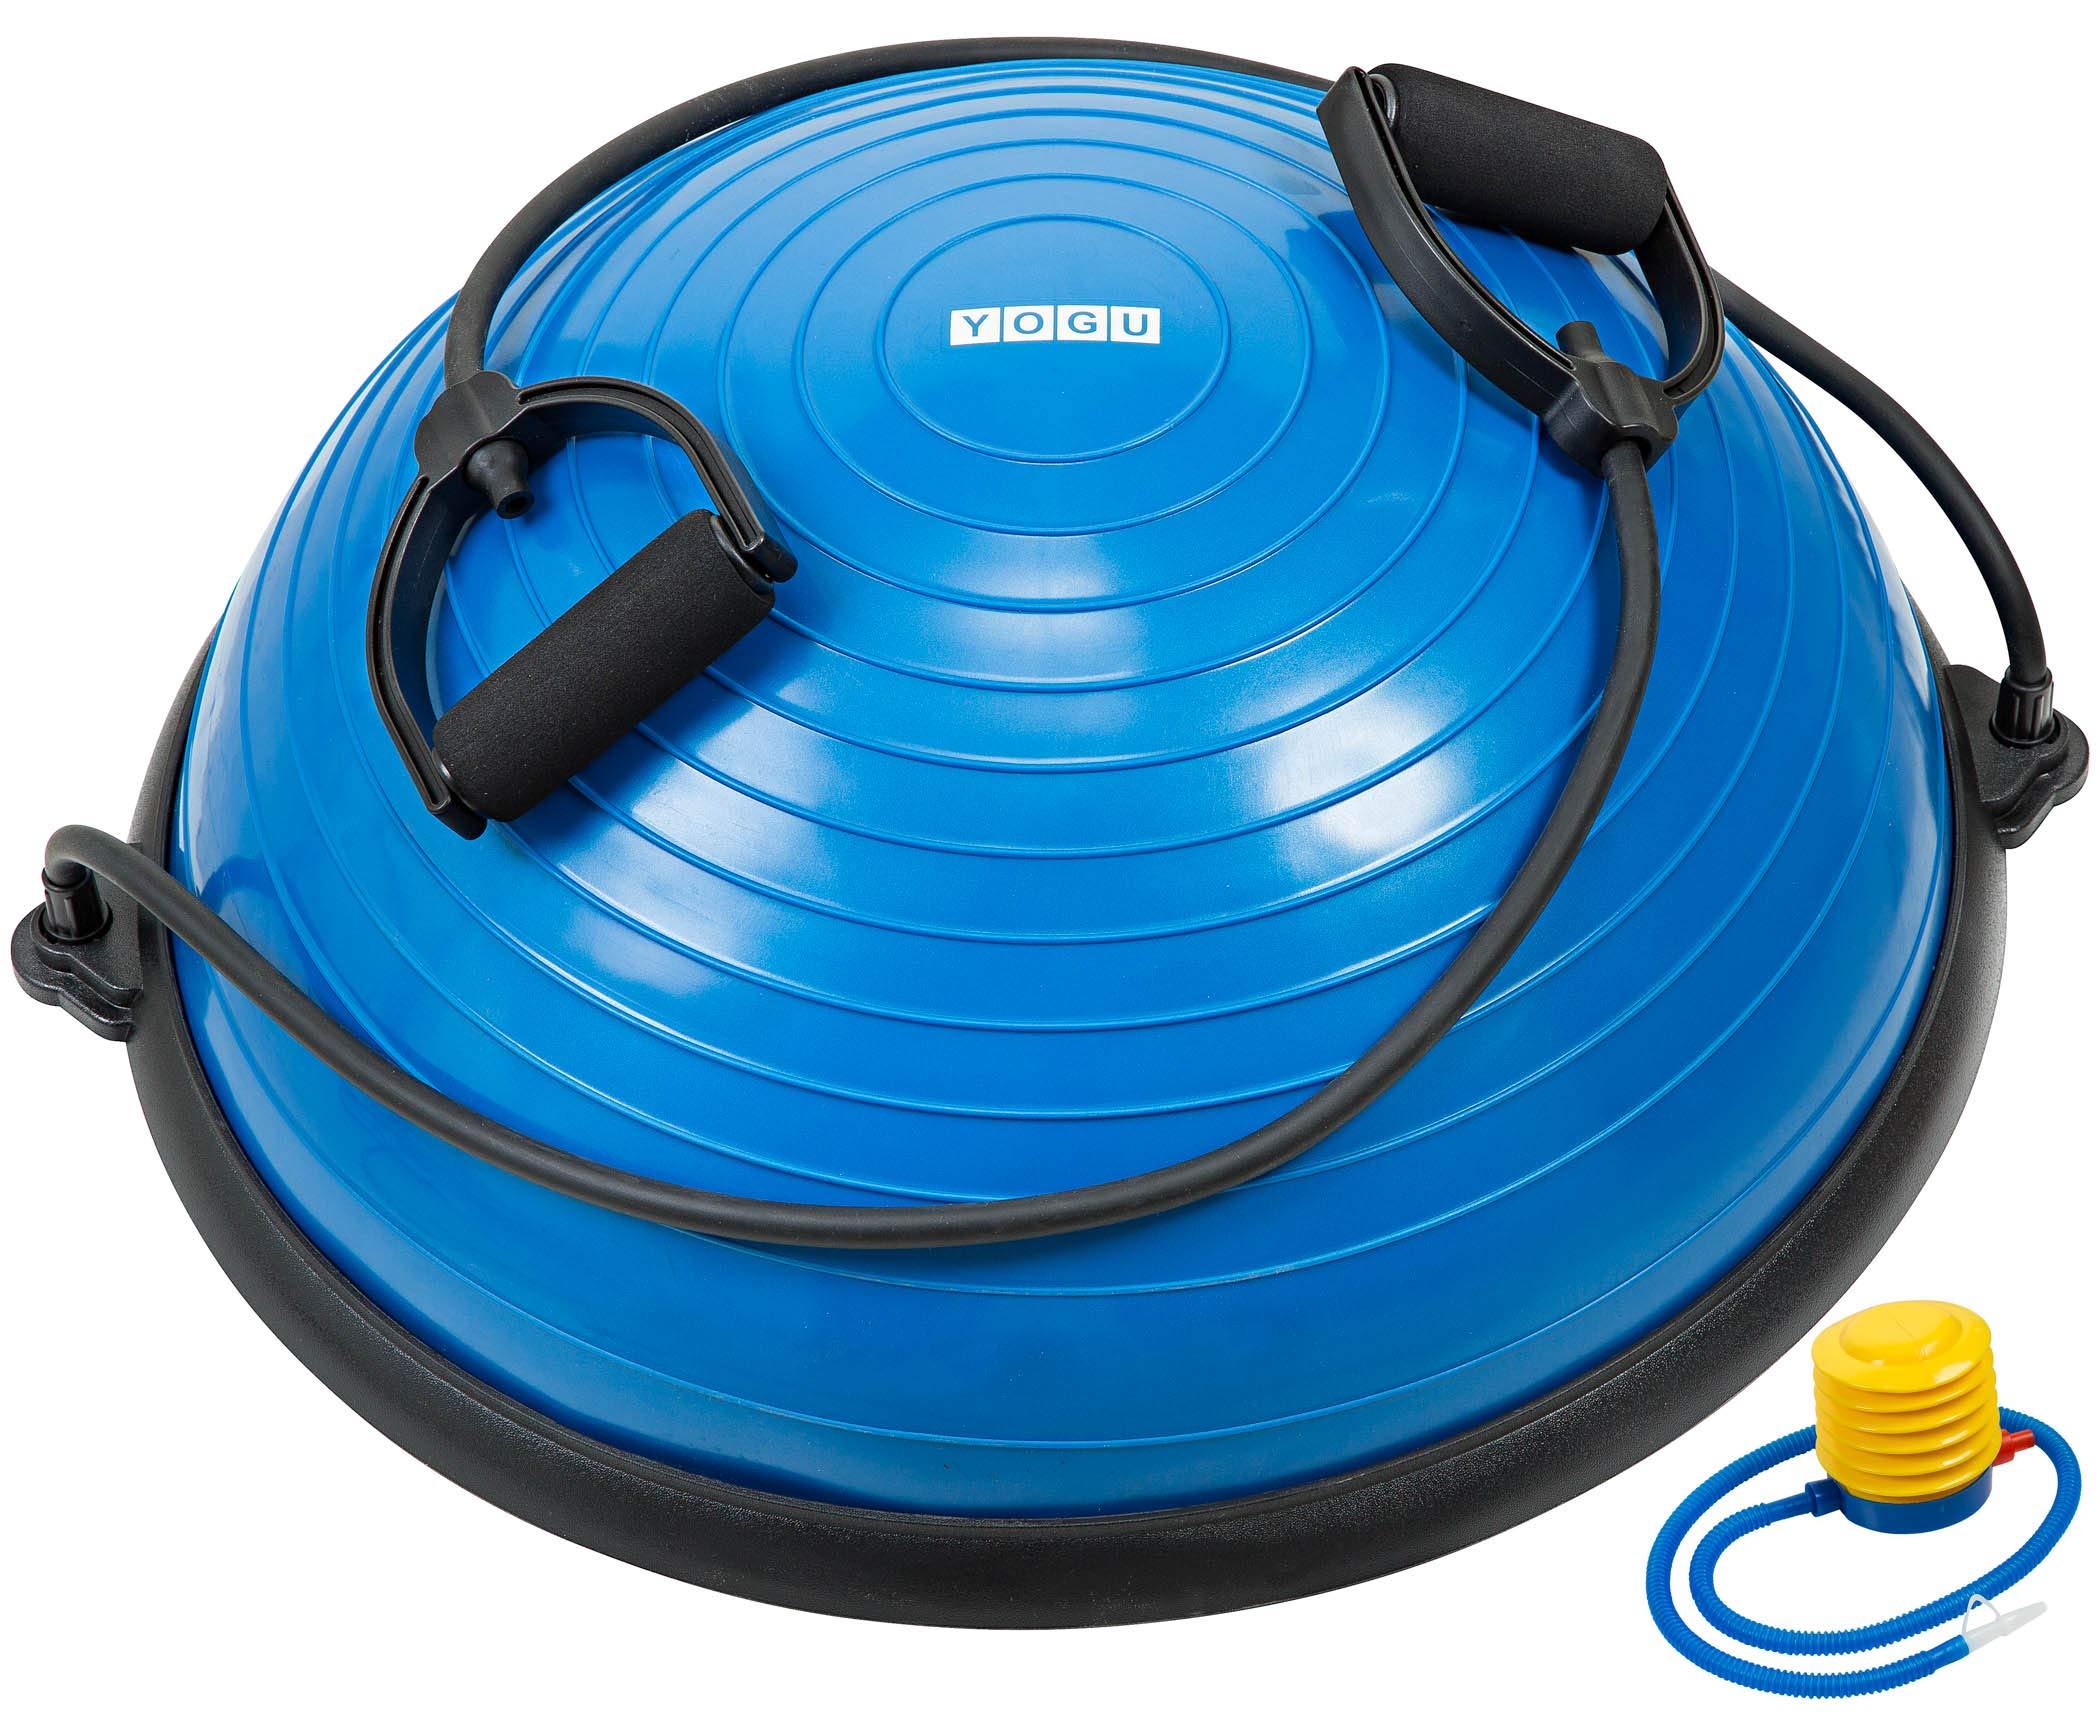 YOGU Balance Trainer Exercise Yoga Ball Trainer w/ 2 Resistance Bands & Pump (Blue)